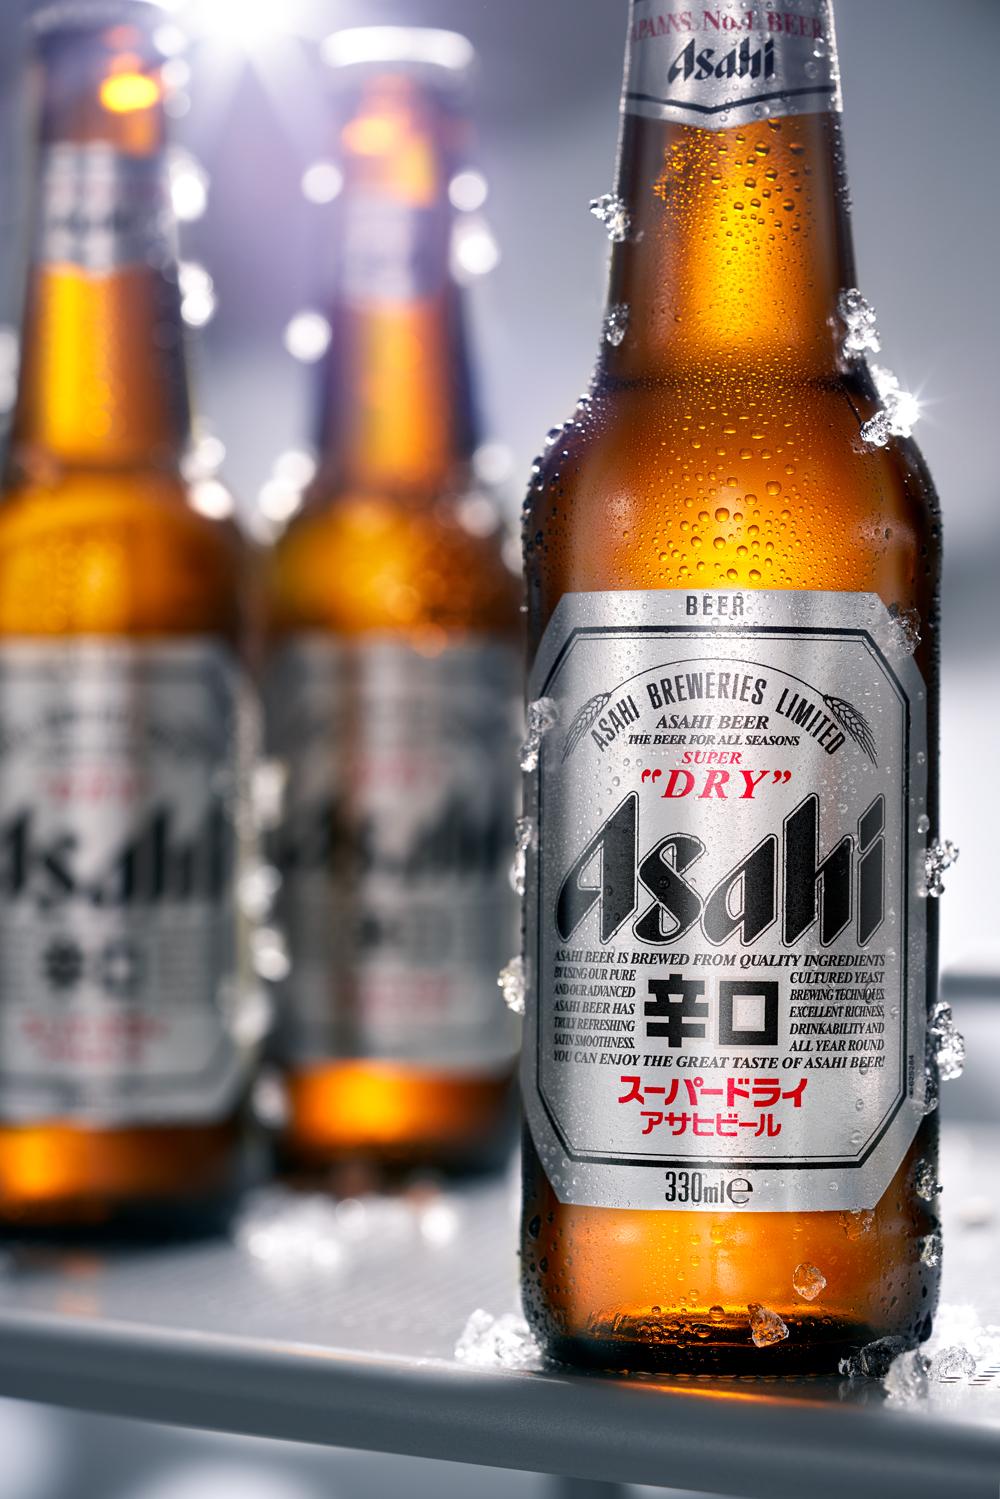 lettstudio_asahi_beer_beverage_photography2.jpg